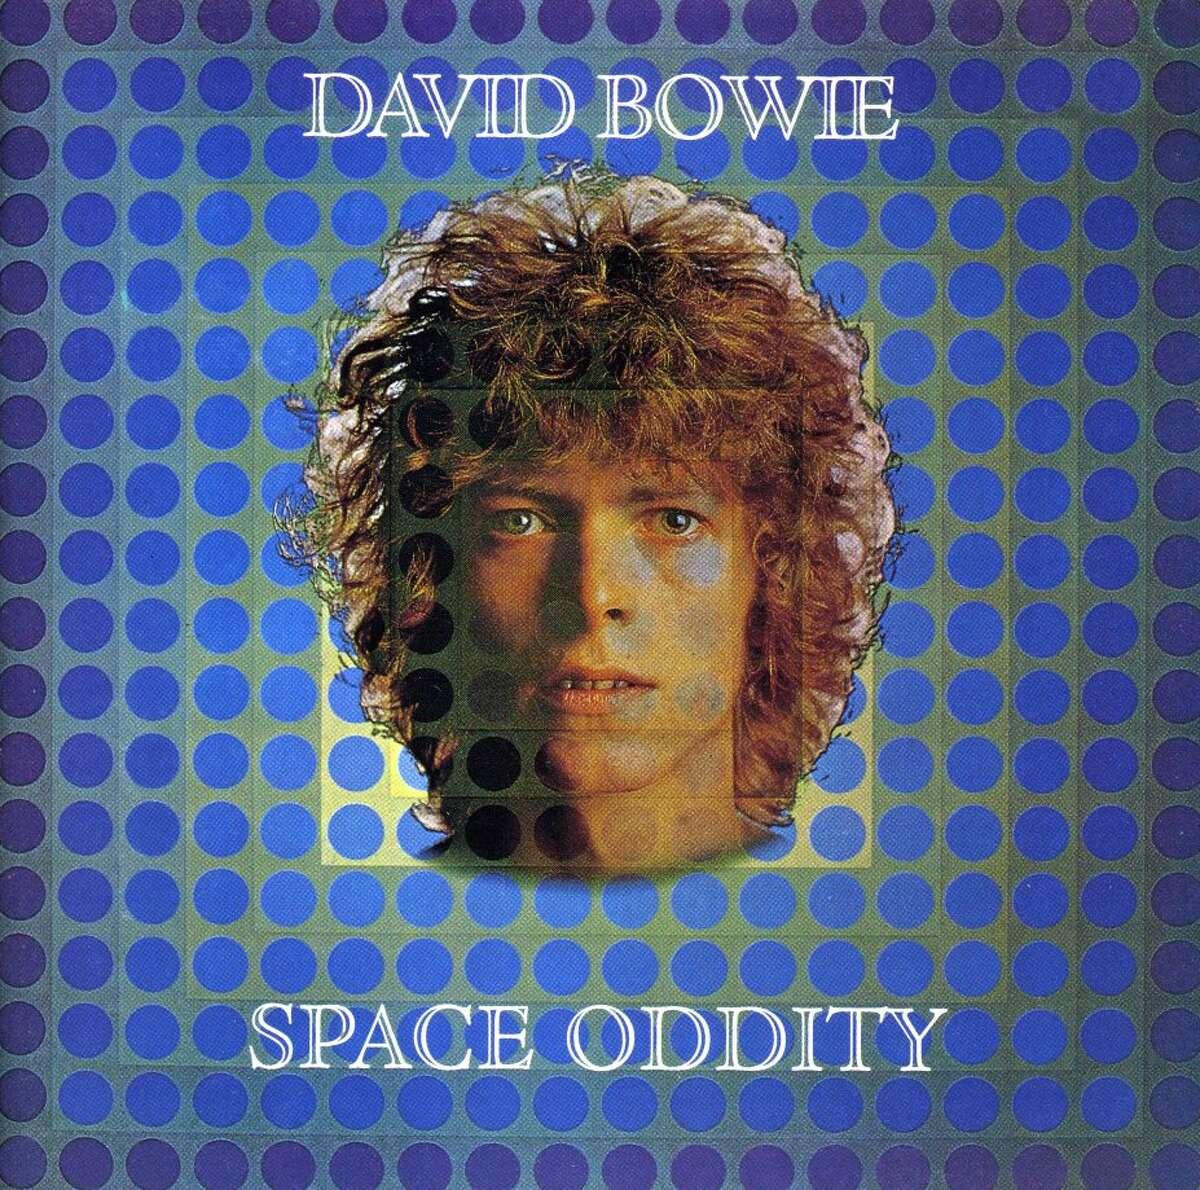 1969: Space Oddity